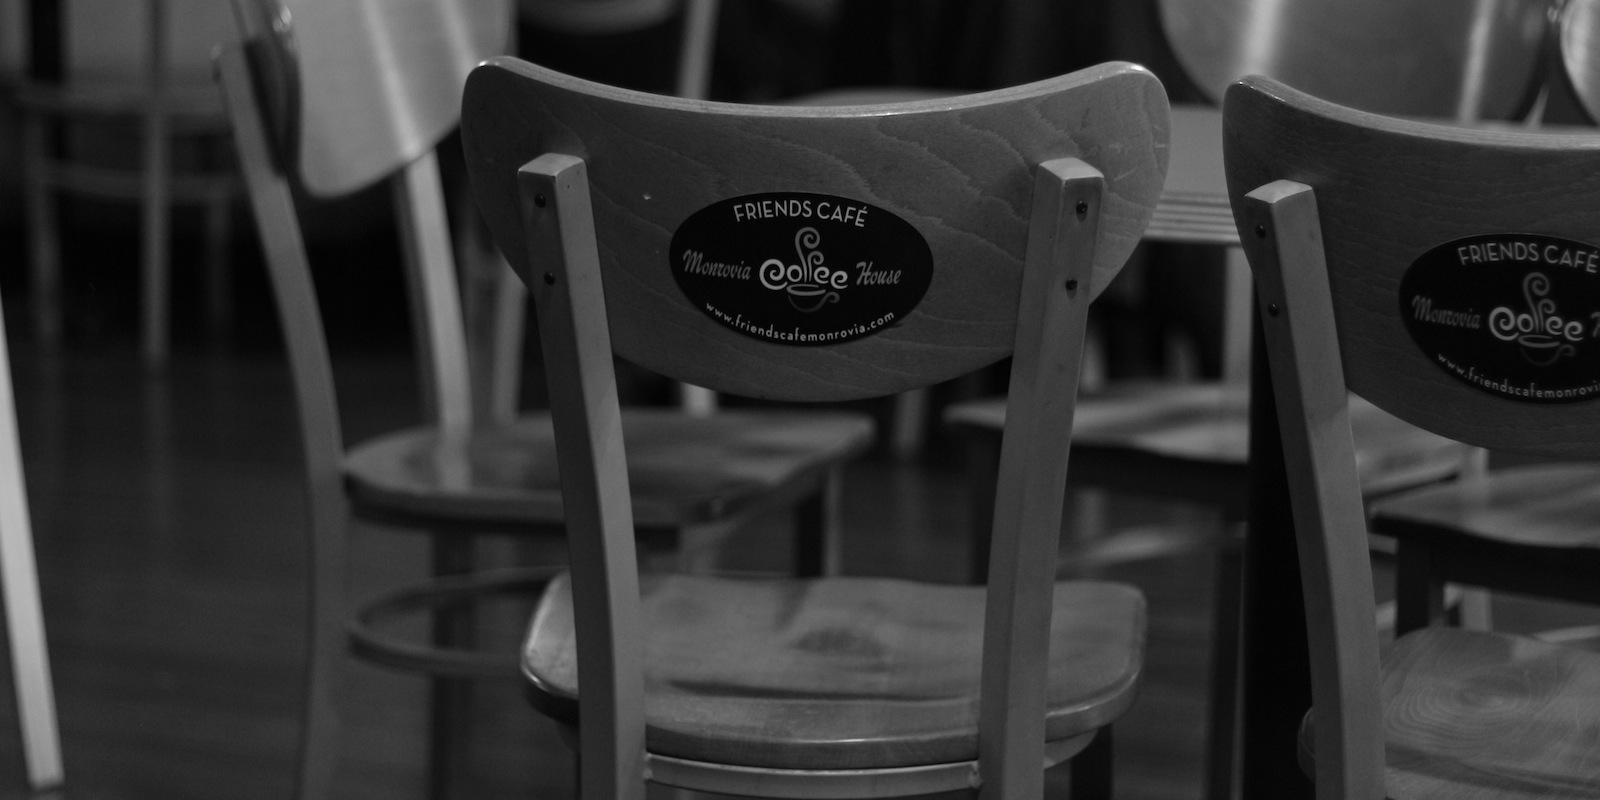 MonroviaFriendsCafe